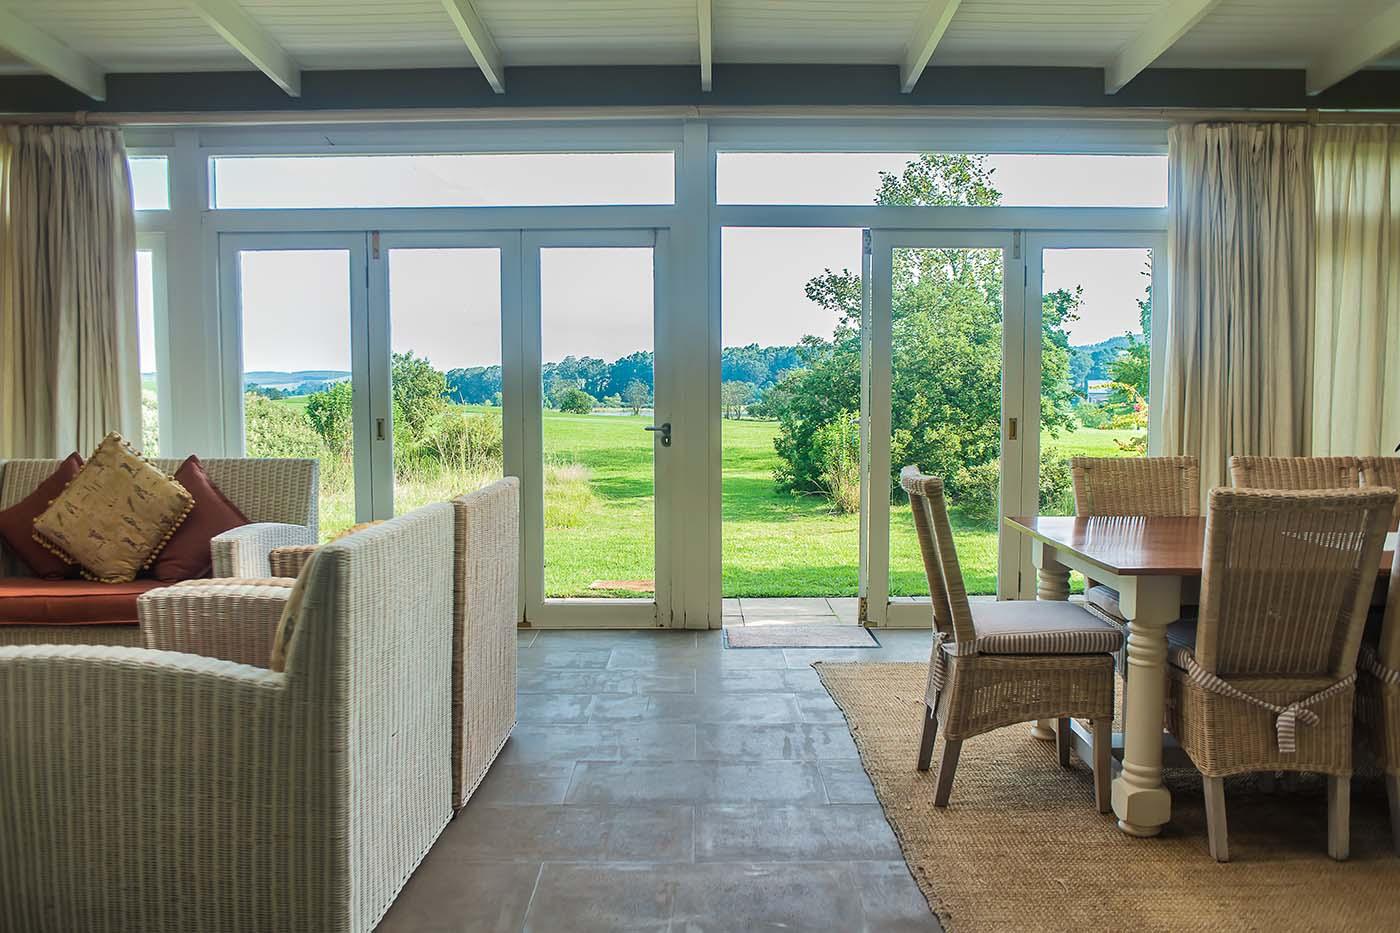 old-tom-morris-cottage-gallery-accommodation-gowrie-midlands-golf-drakensberg